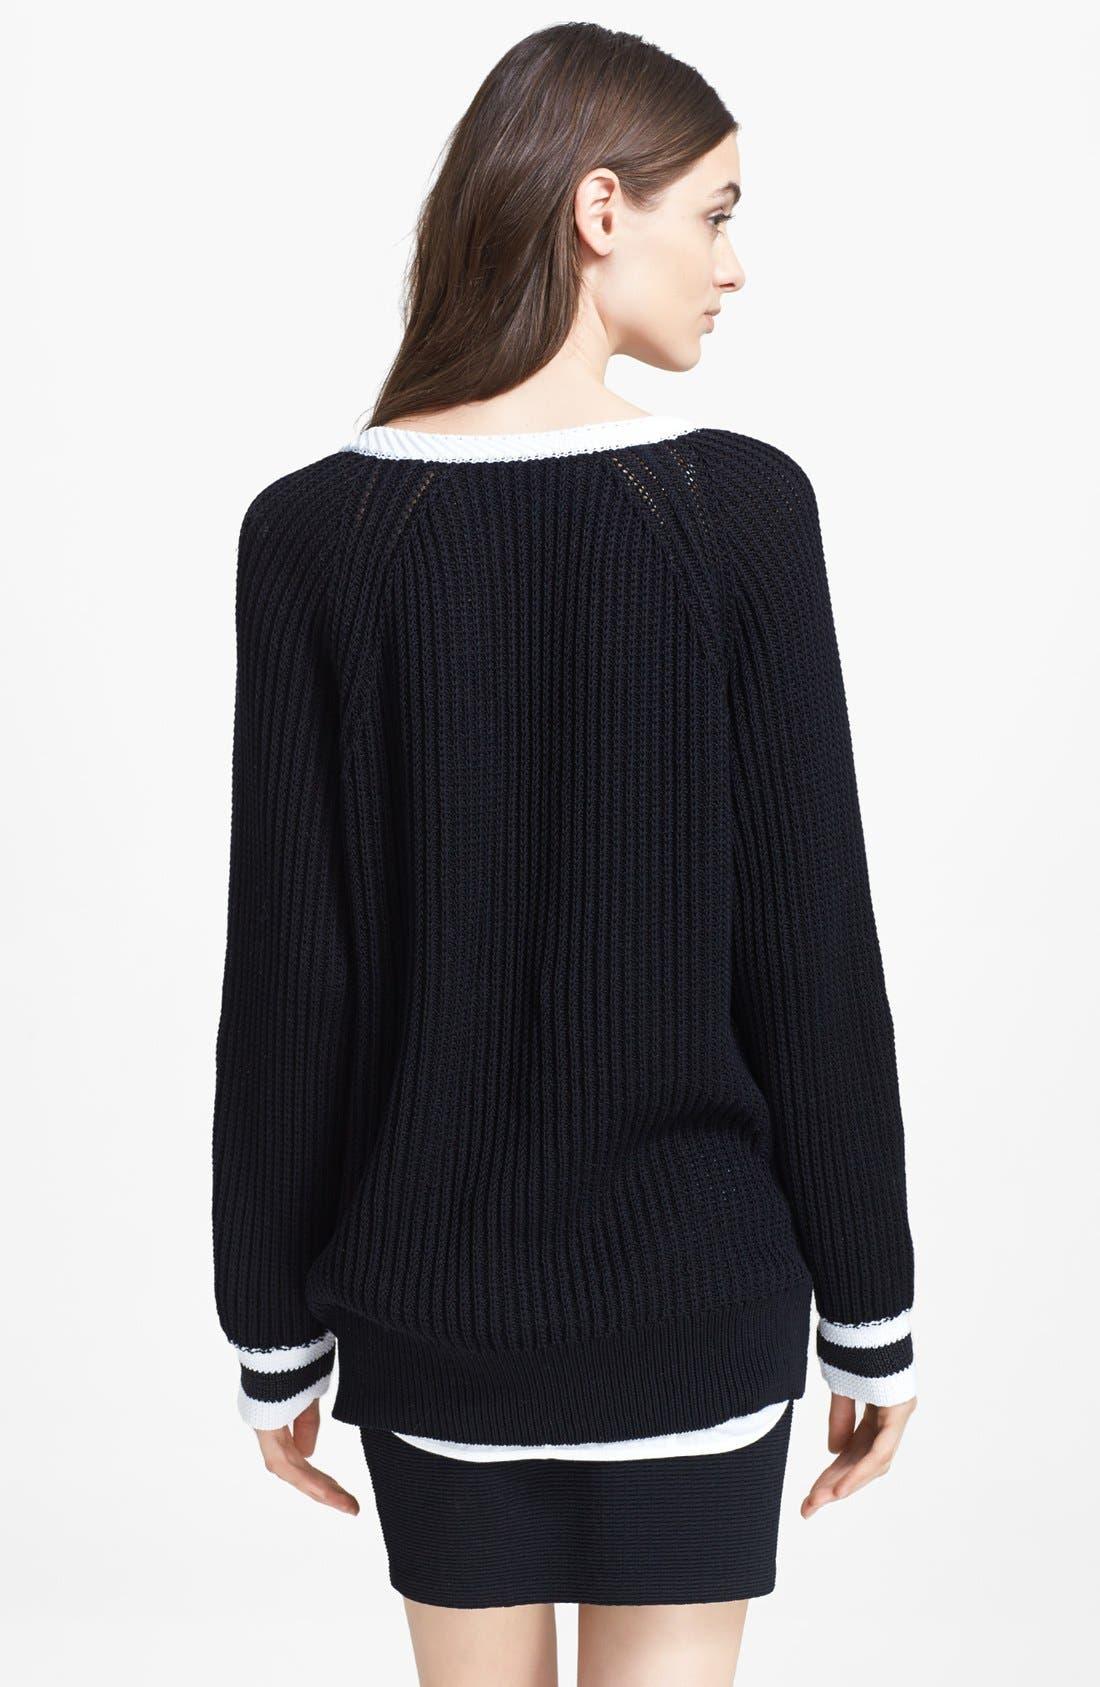 RAG & BONE, 'Talia' V-Neck Sweater, Alternate thumbnail 2, color, 001